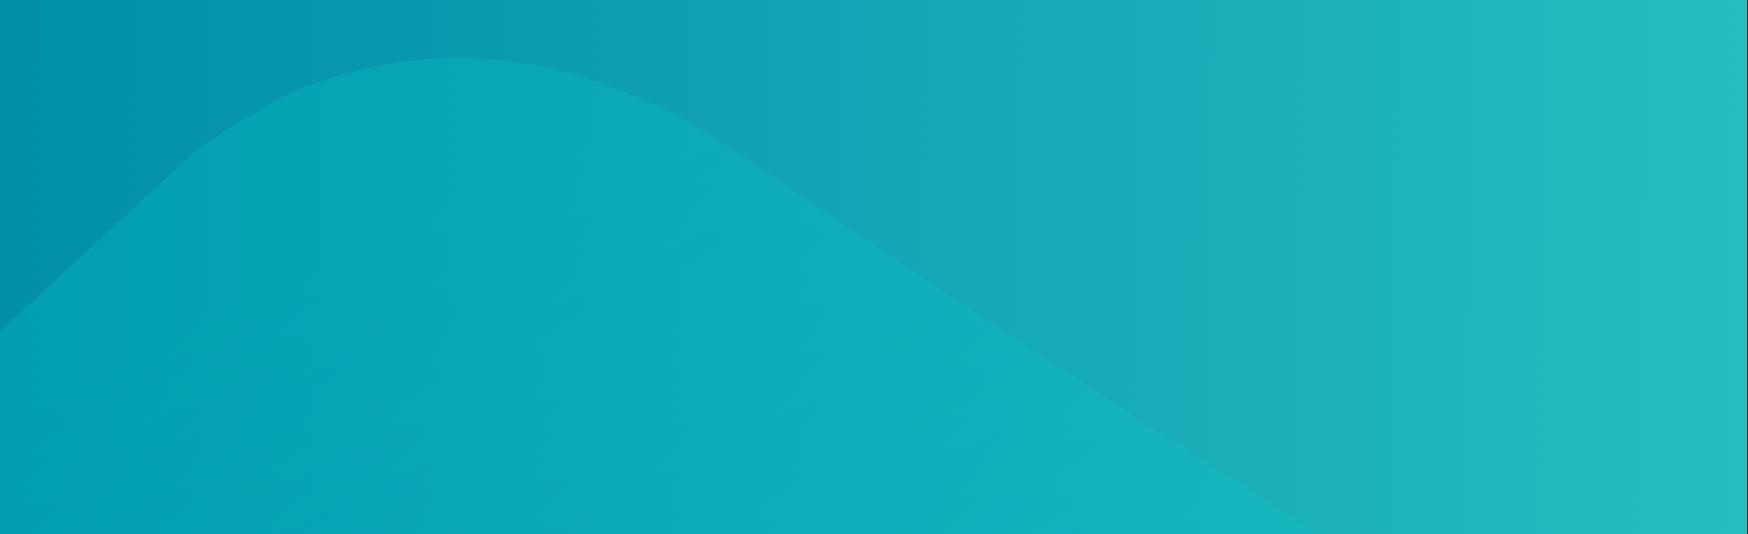 CTA Background Image - Blue Gradient